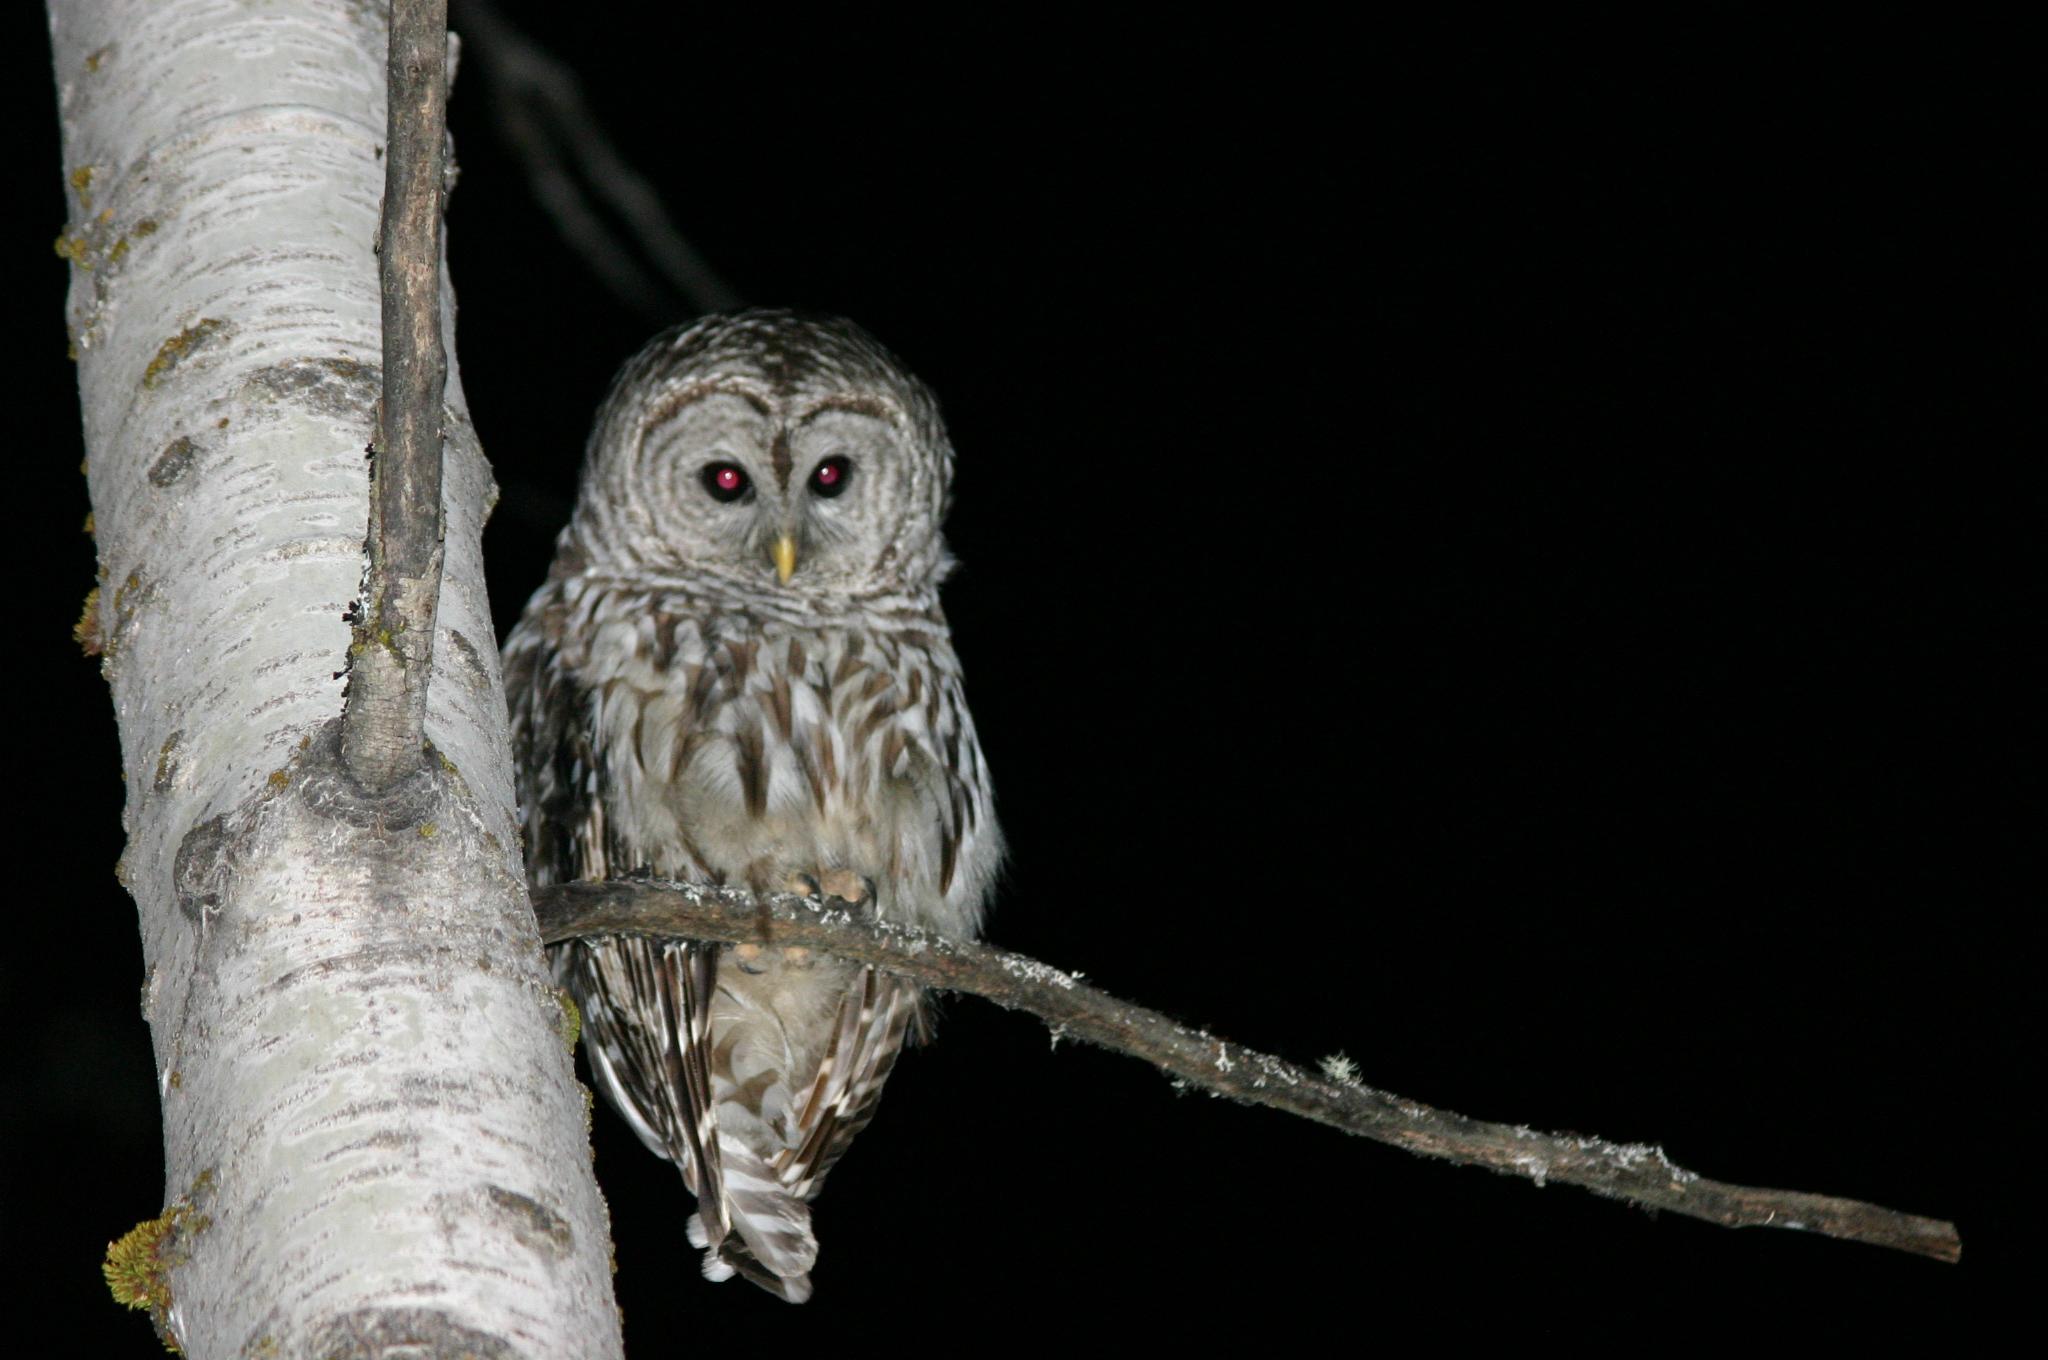 File:Owl at Night.jpg - Wikimedia Commons